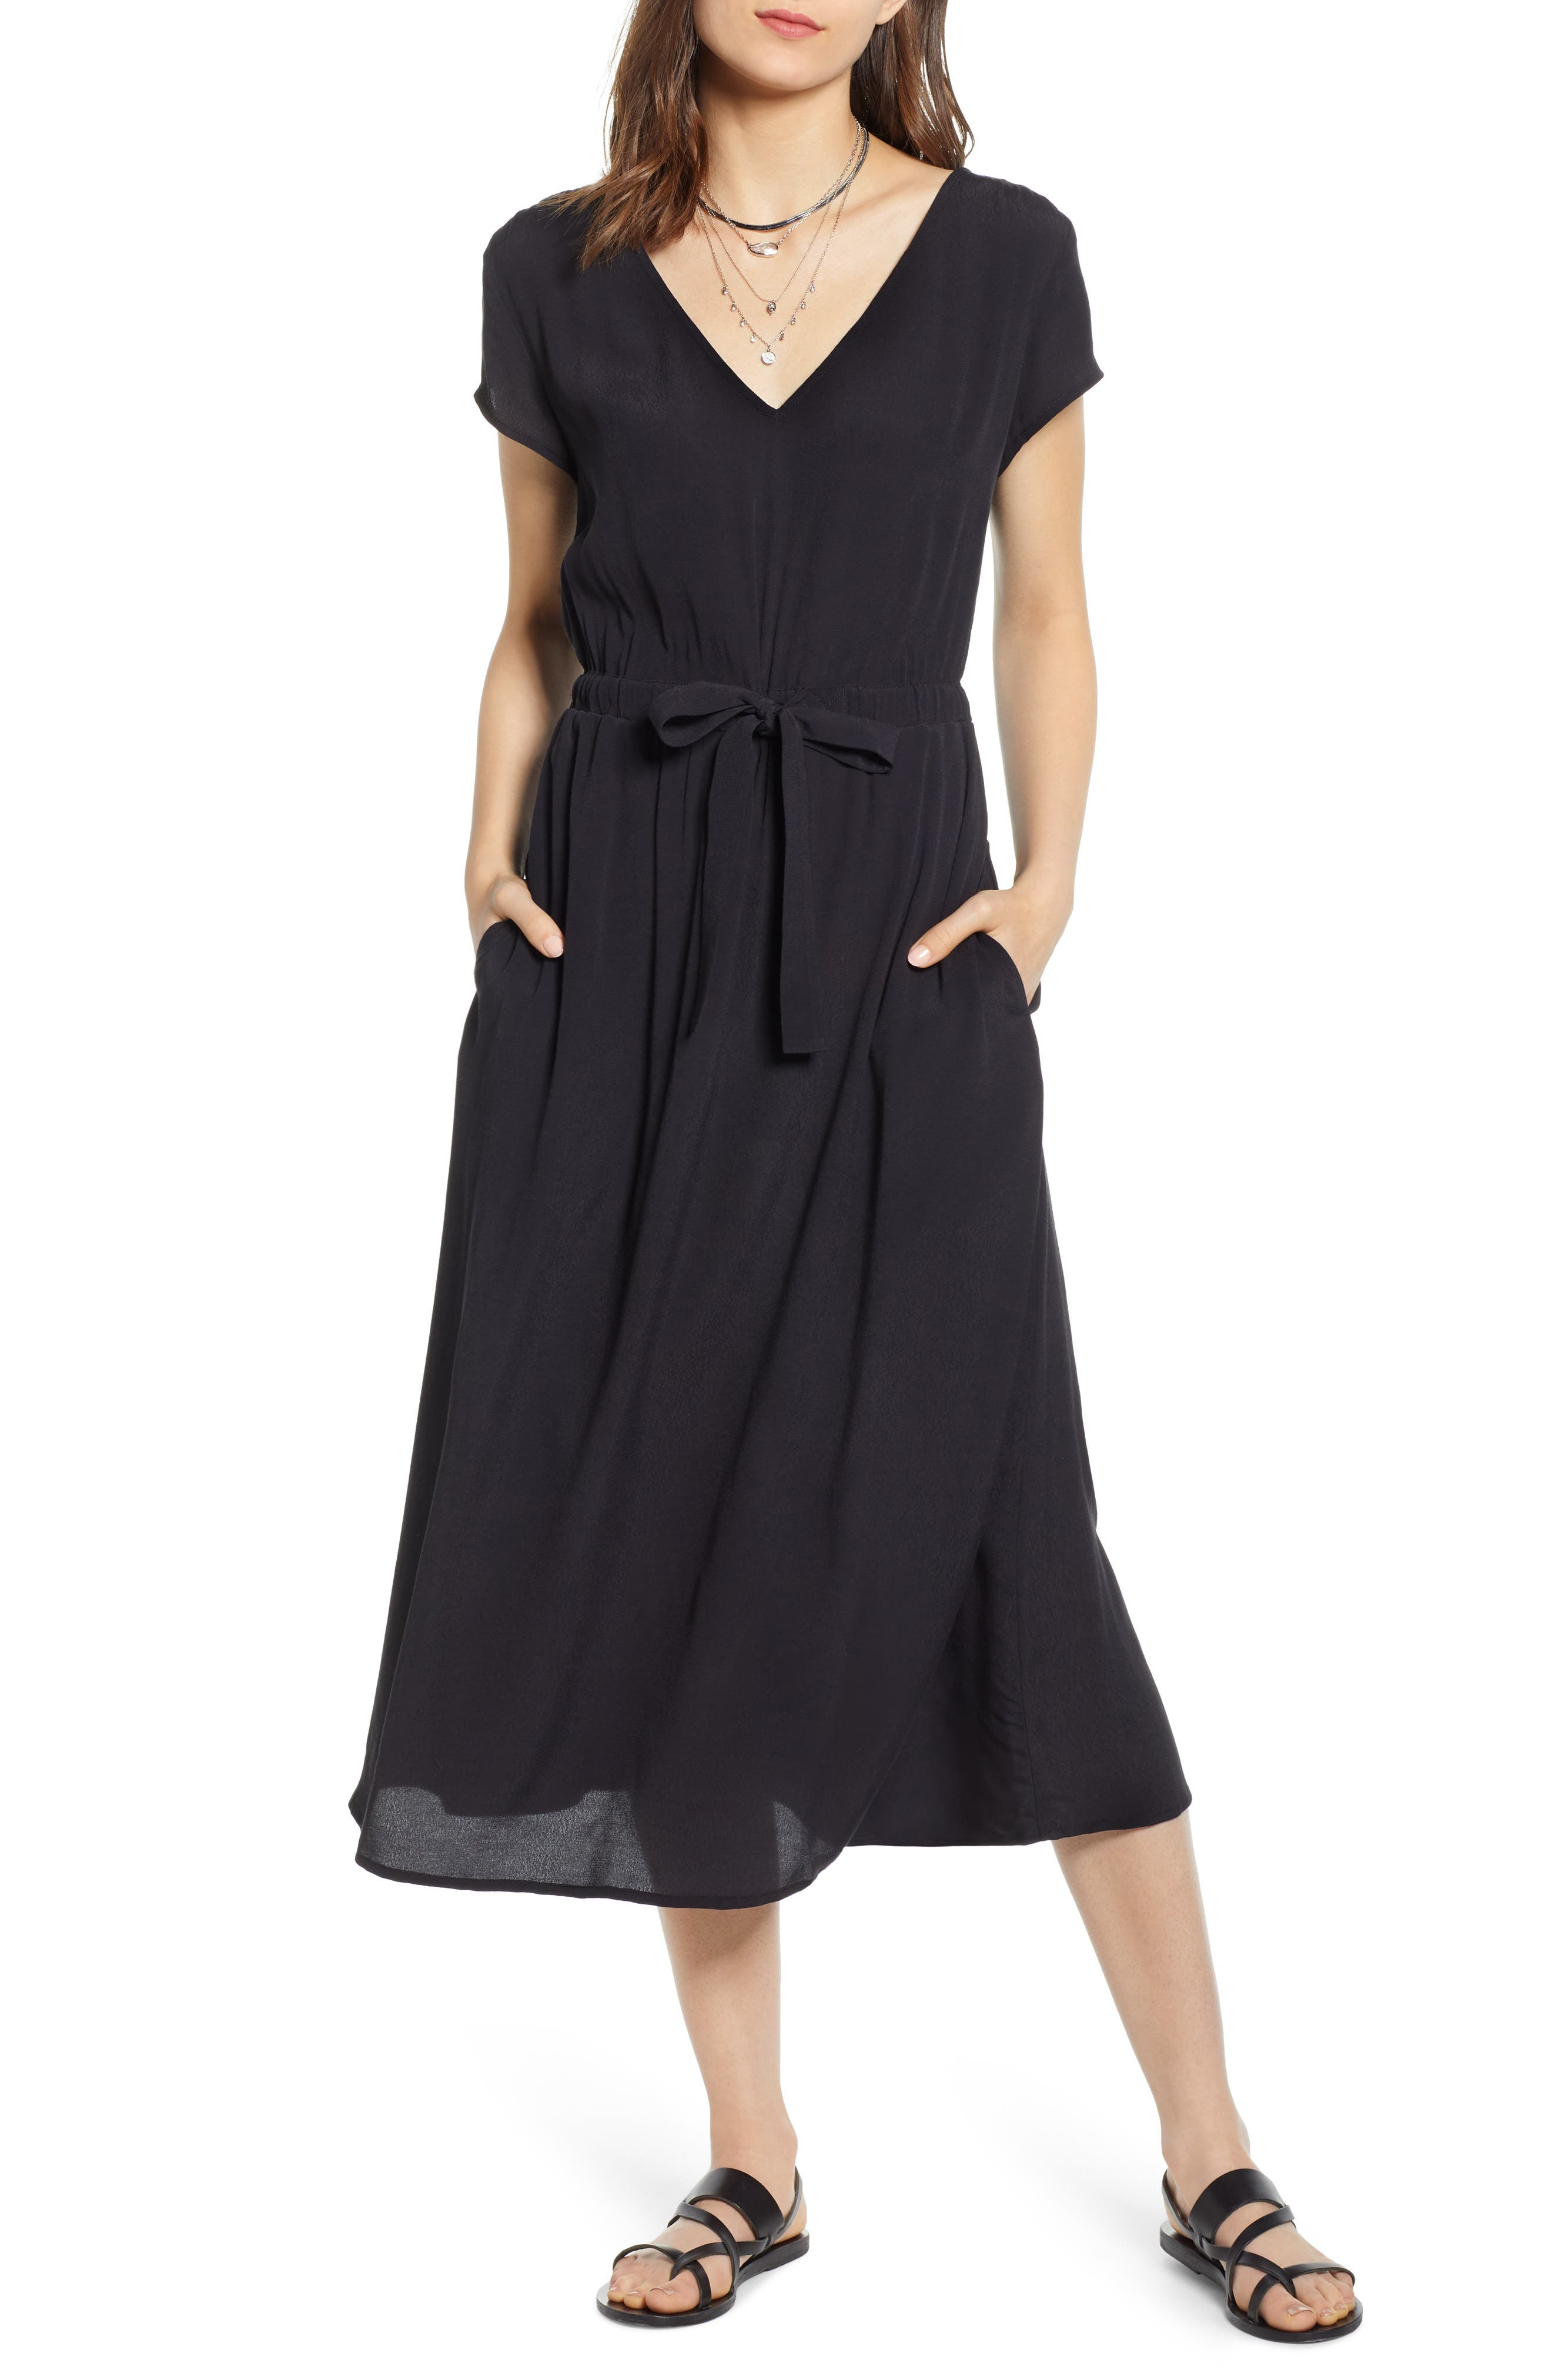 TREASURE & BOND, Cap Sleeve Midi Dress, Main thumbnail 1, color, BLACK